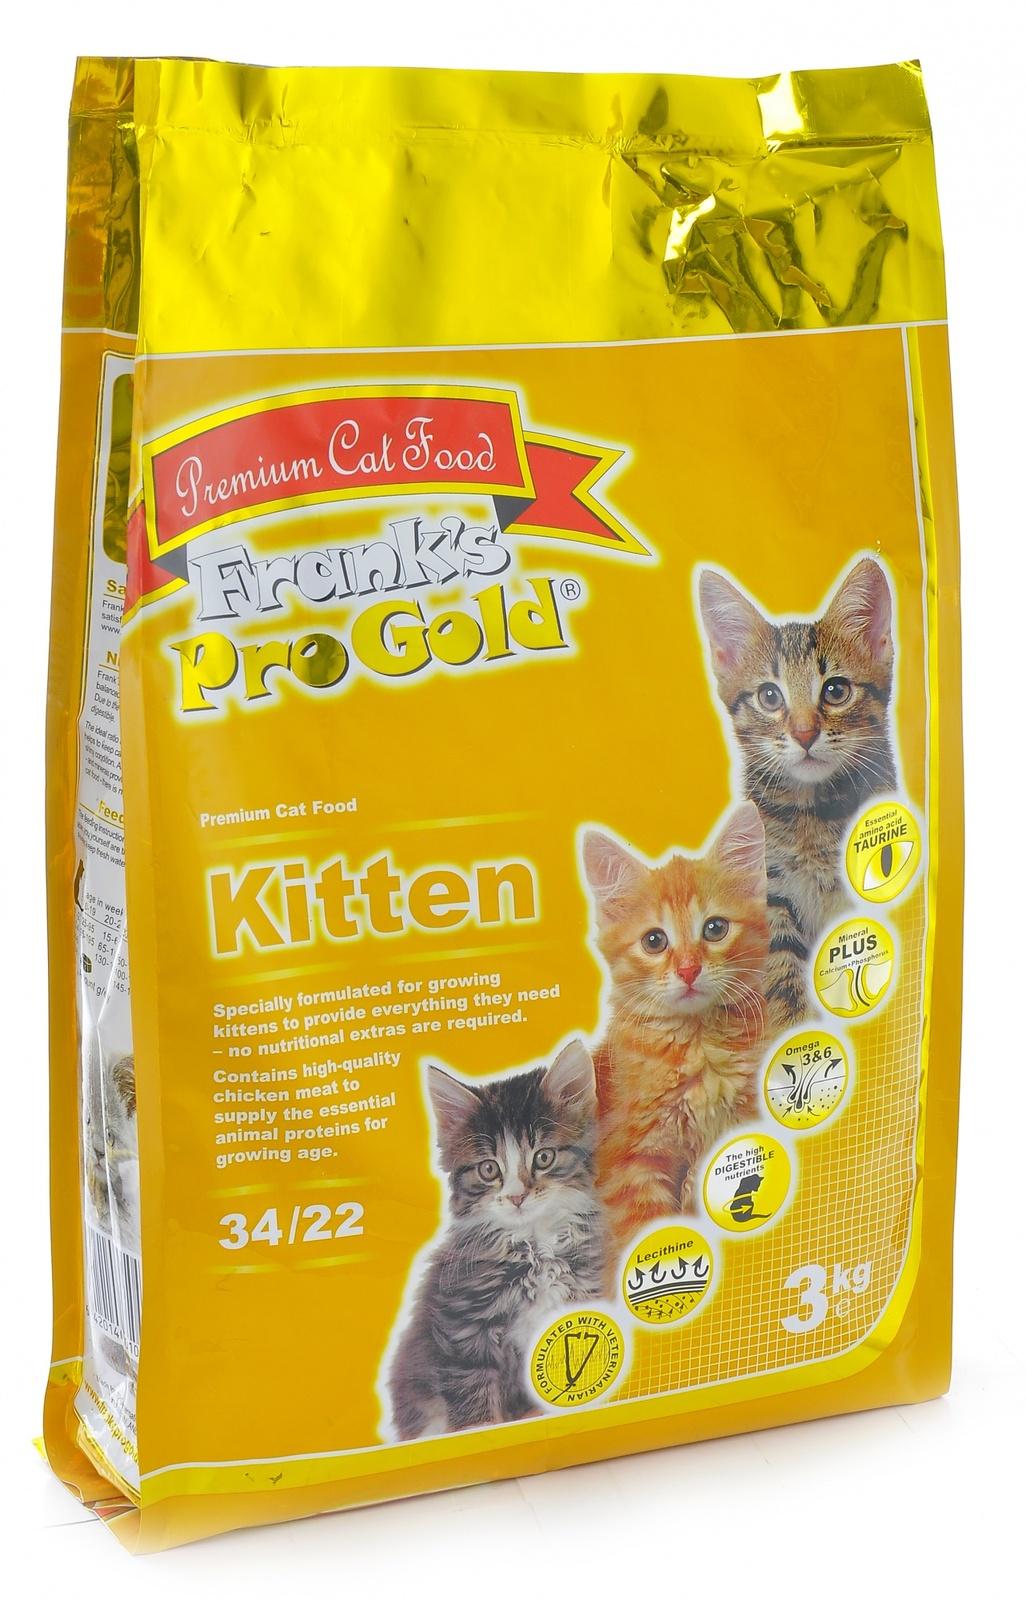 Franks ProGold Для котят: Курица (Kitten 34/22) 7,5кгПовседневные корма<br><br><br>Артикул: 23290<br>Бренд: Franks ProGold<br>Вид: Сухие<br>Для кого: Кошки